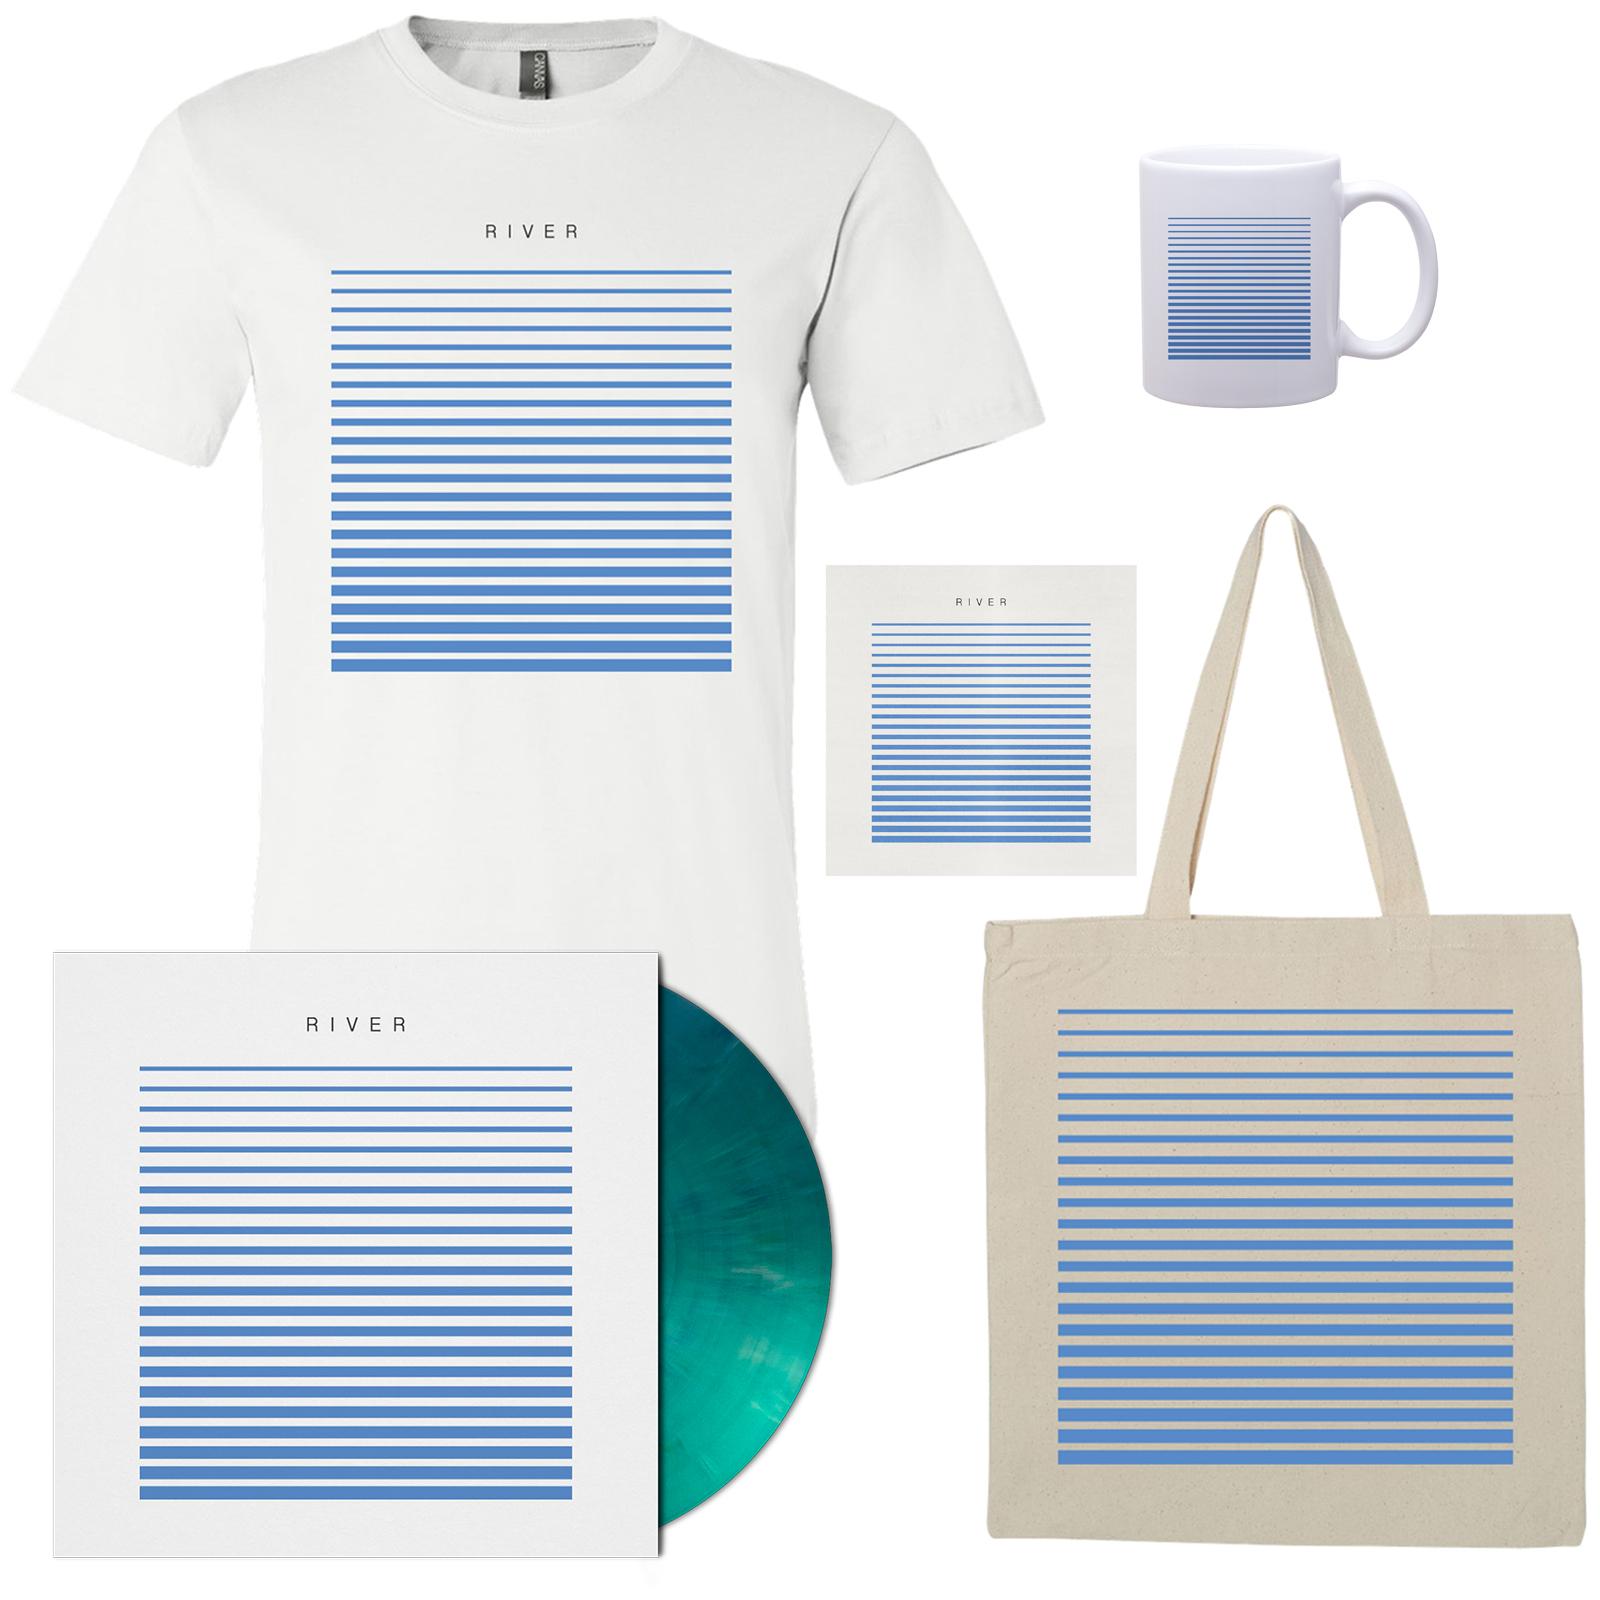 River T-Shirt - White, Tote, Mug, Vinyl, and CD Bundle